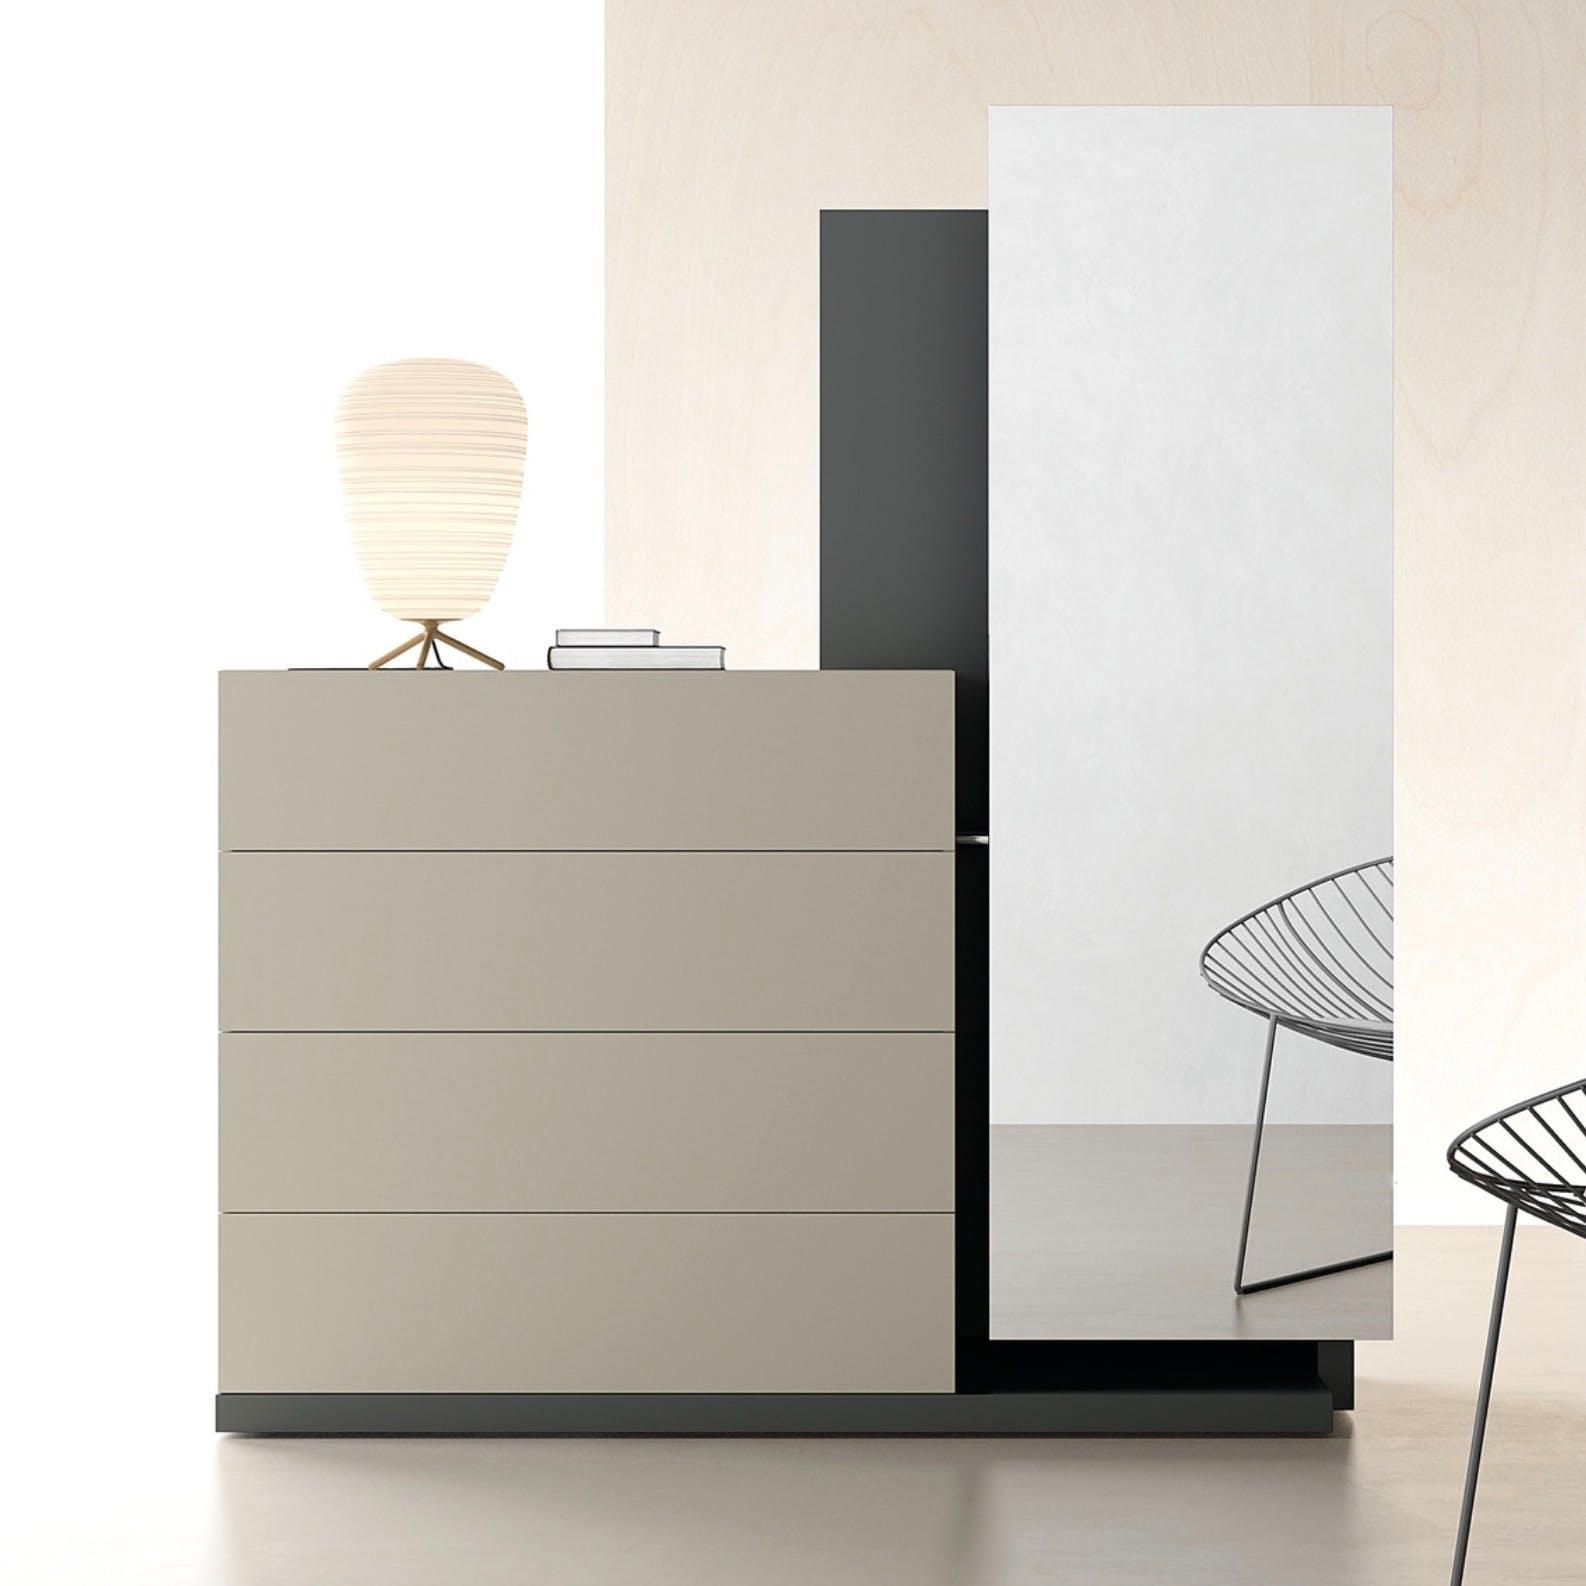 Caccaro Filnox System Mirror Haute Living